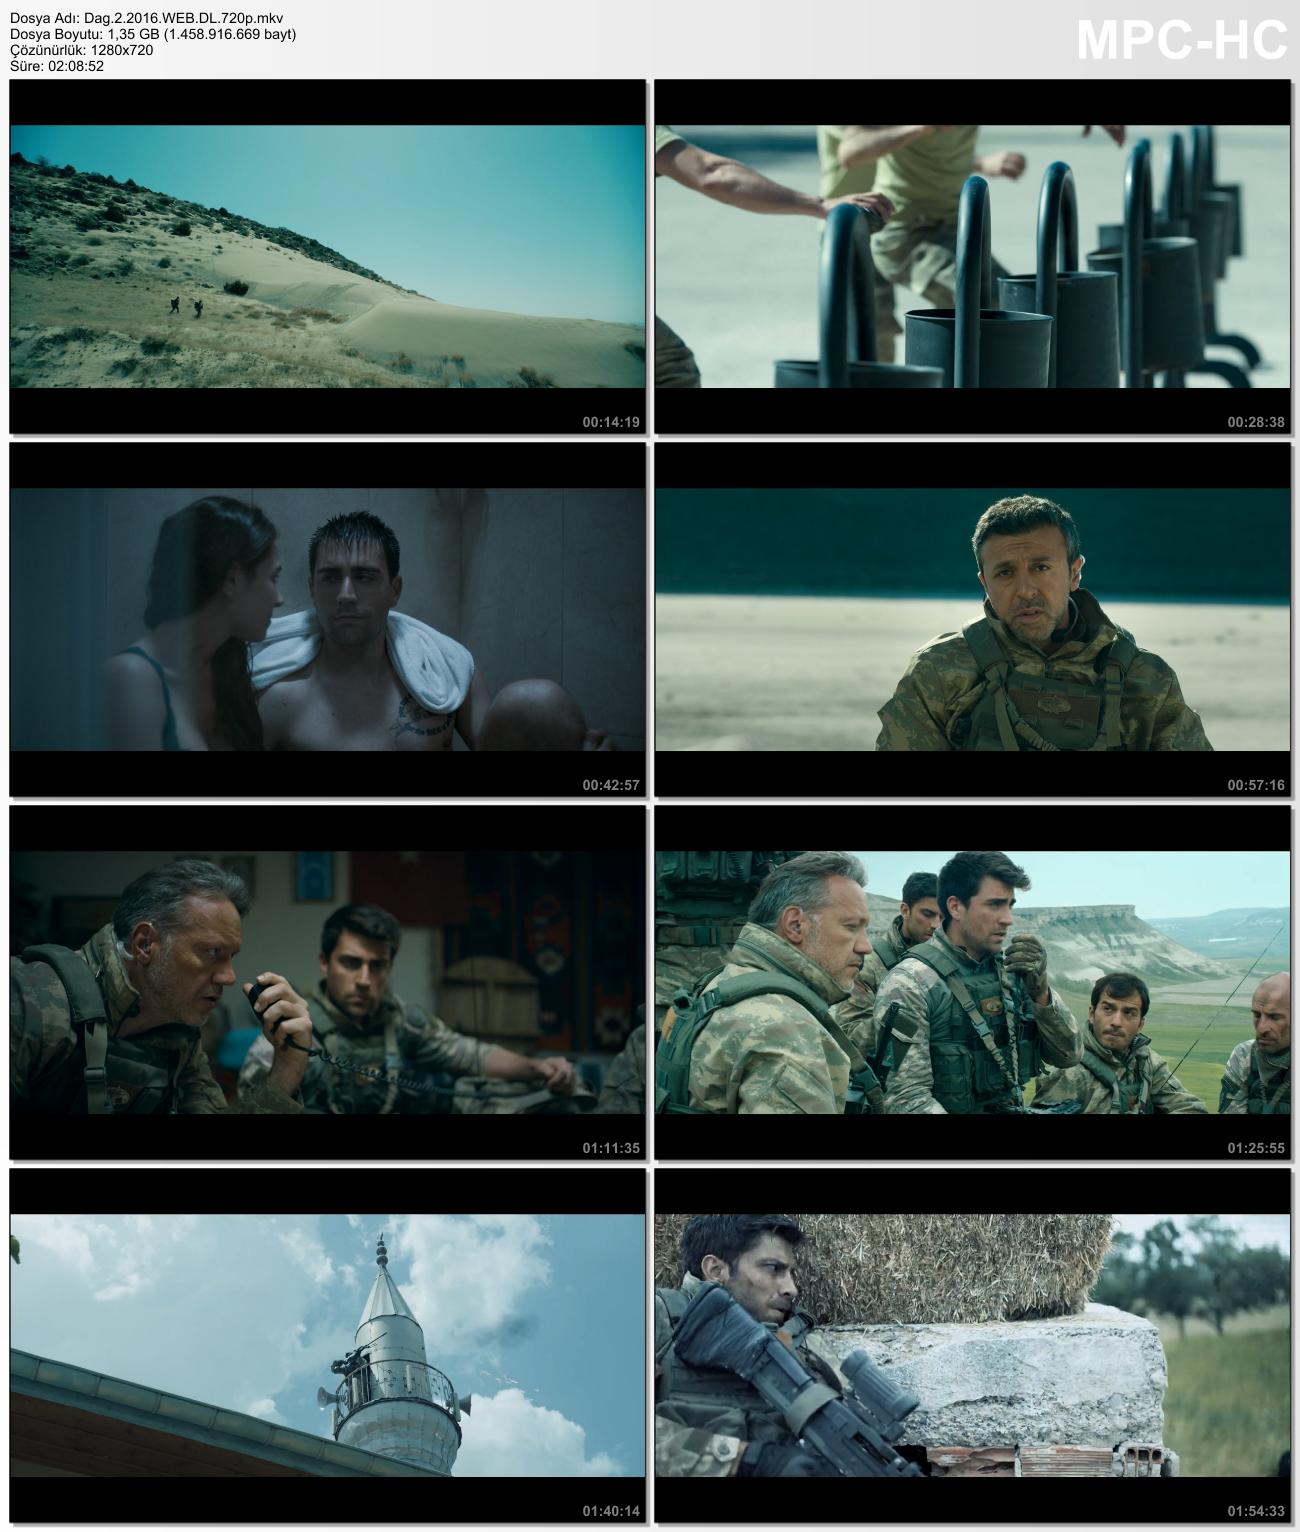 Dağ 2 2016 (Yerli Film) WEB-DL 720p - Orjinal - Reklamsız